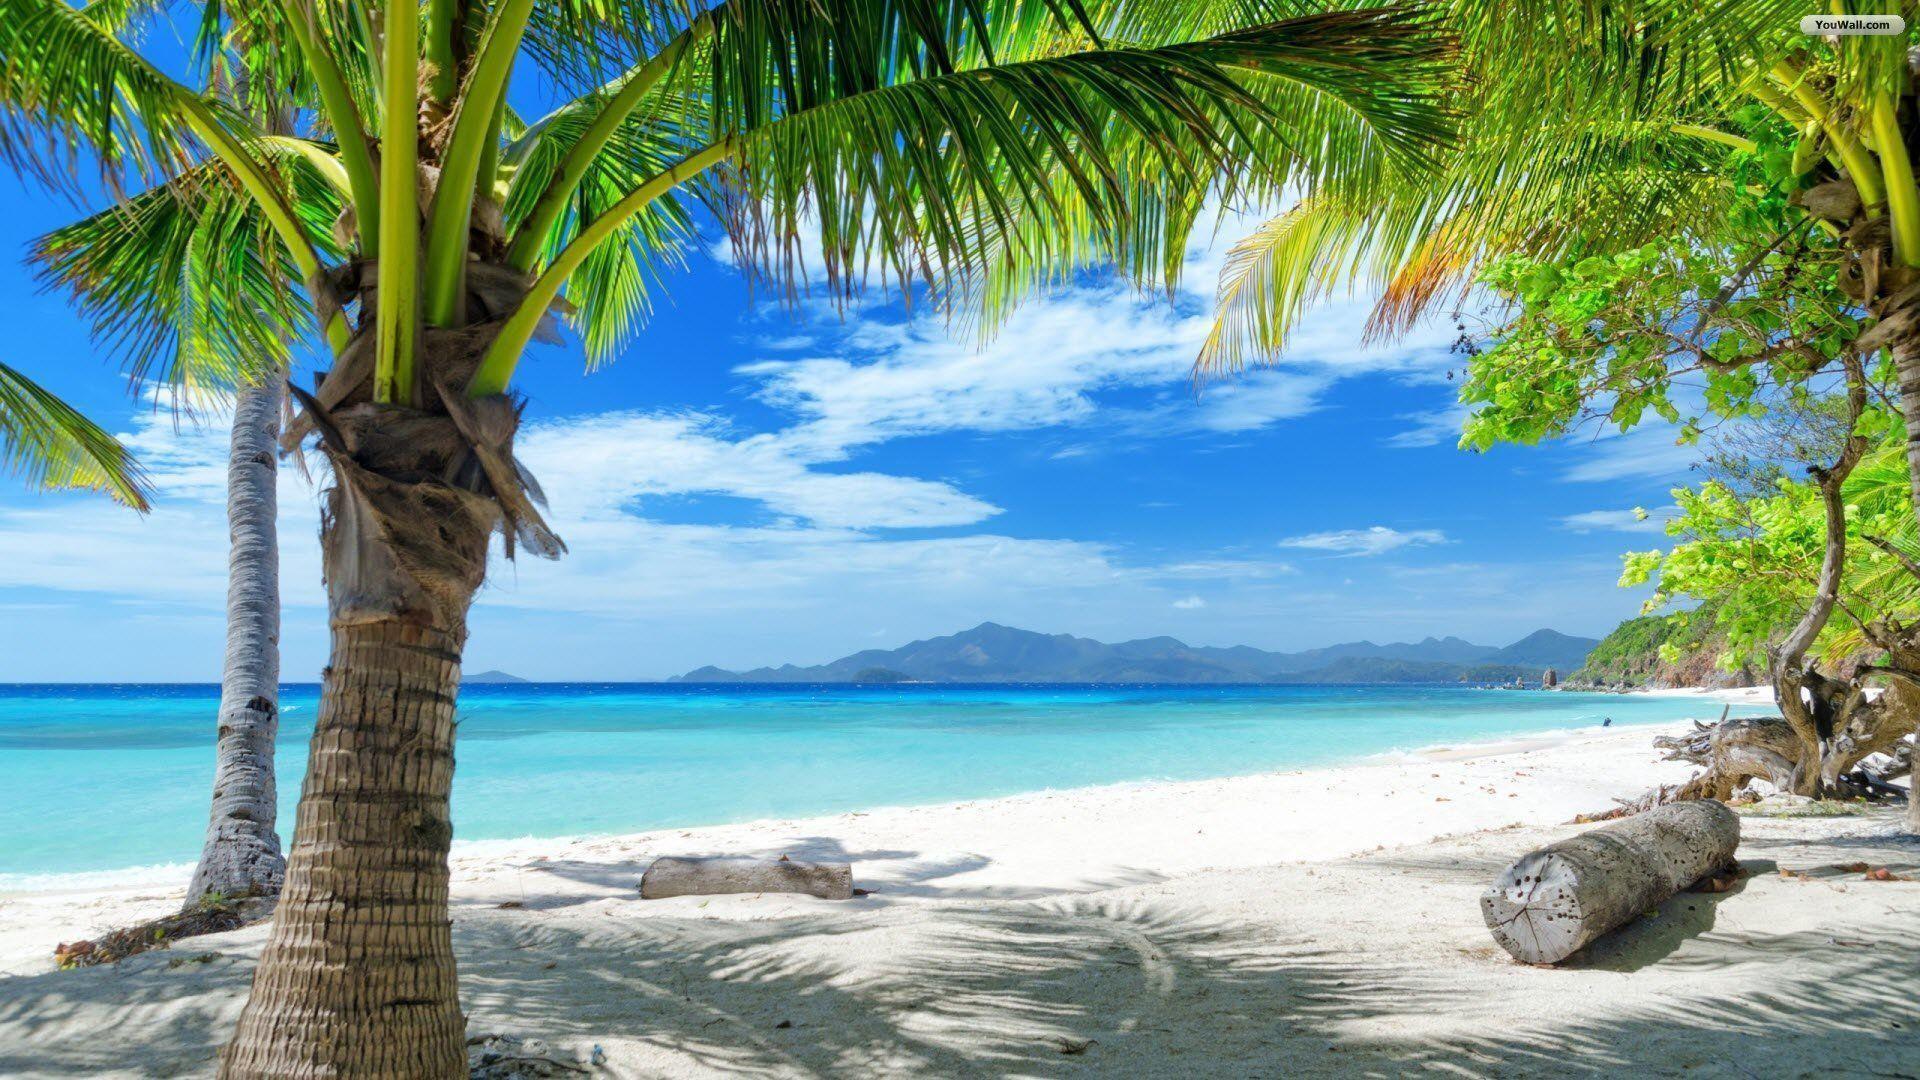 paradise beach wallpaper 69